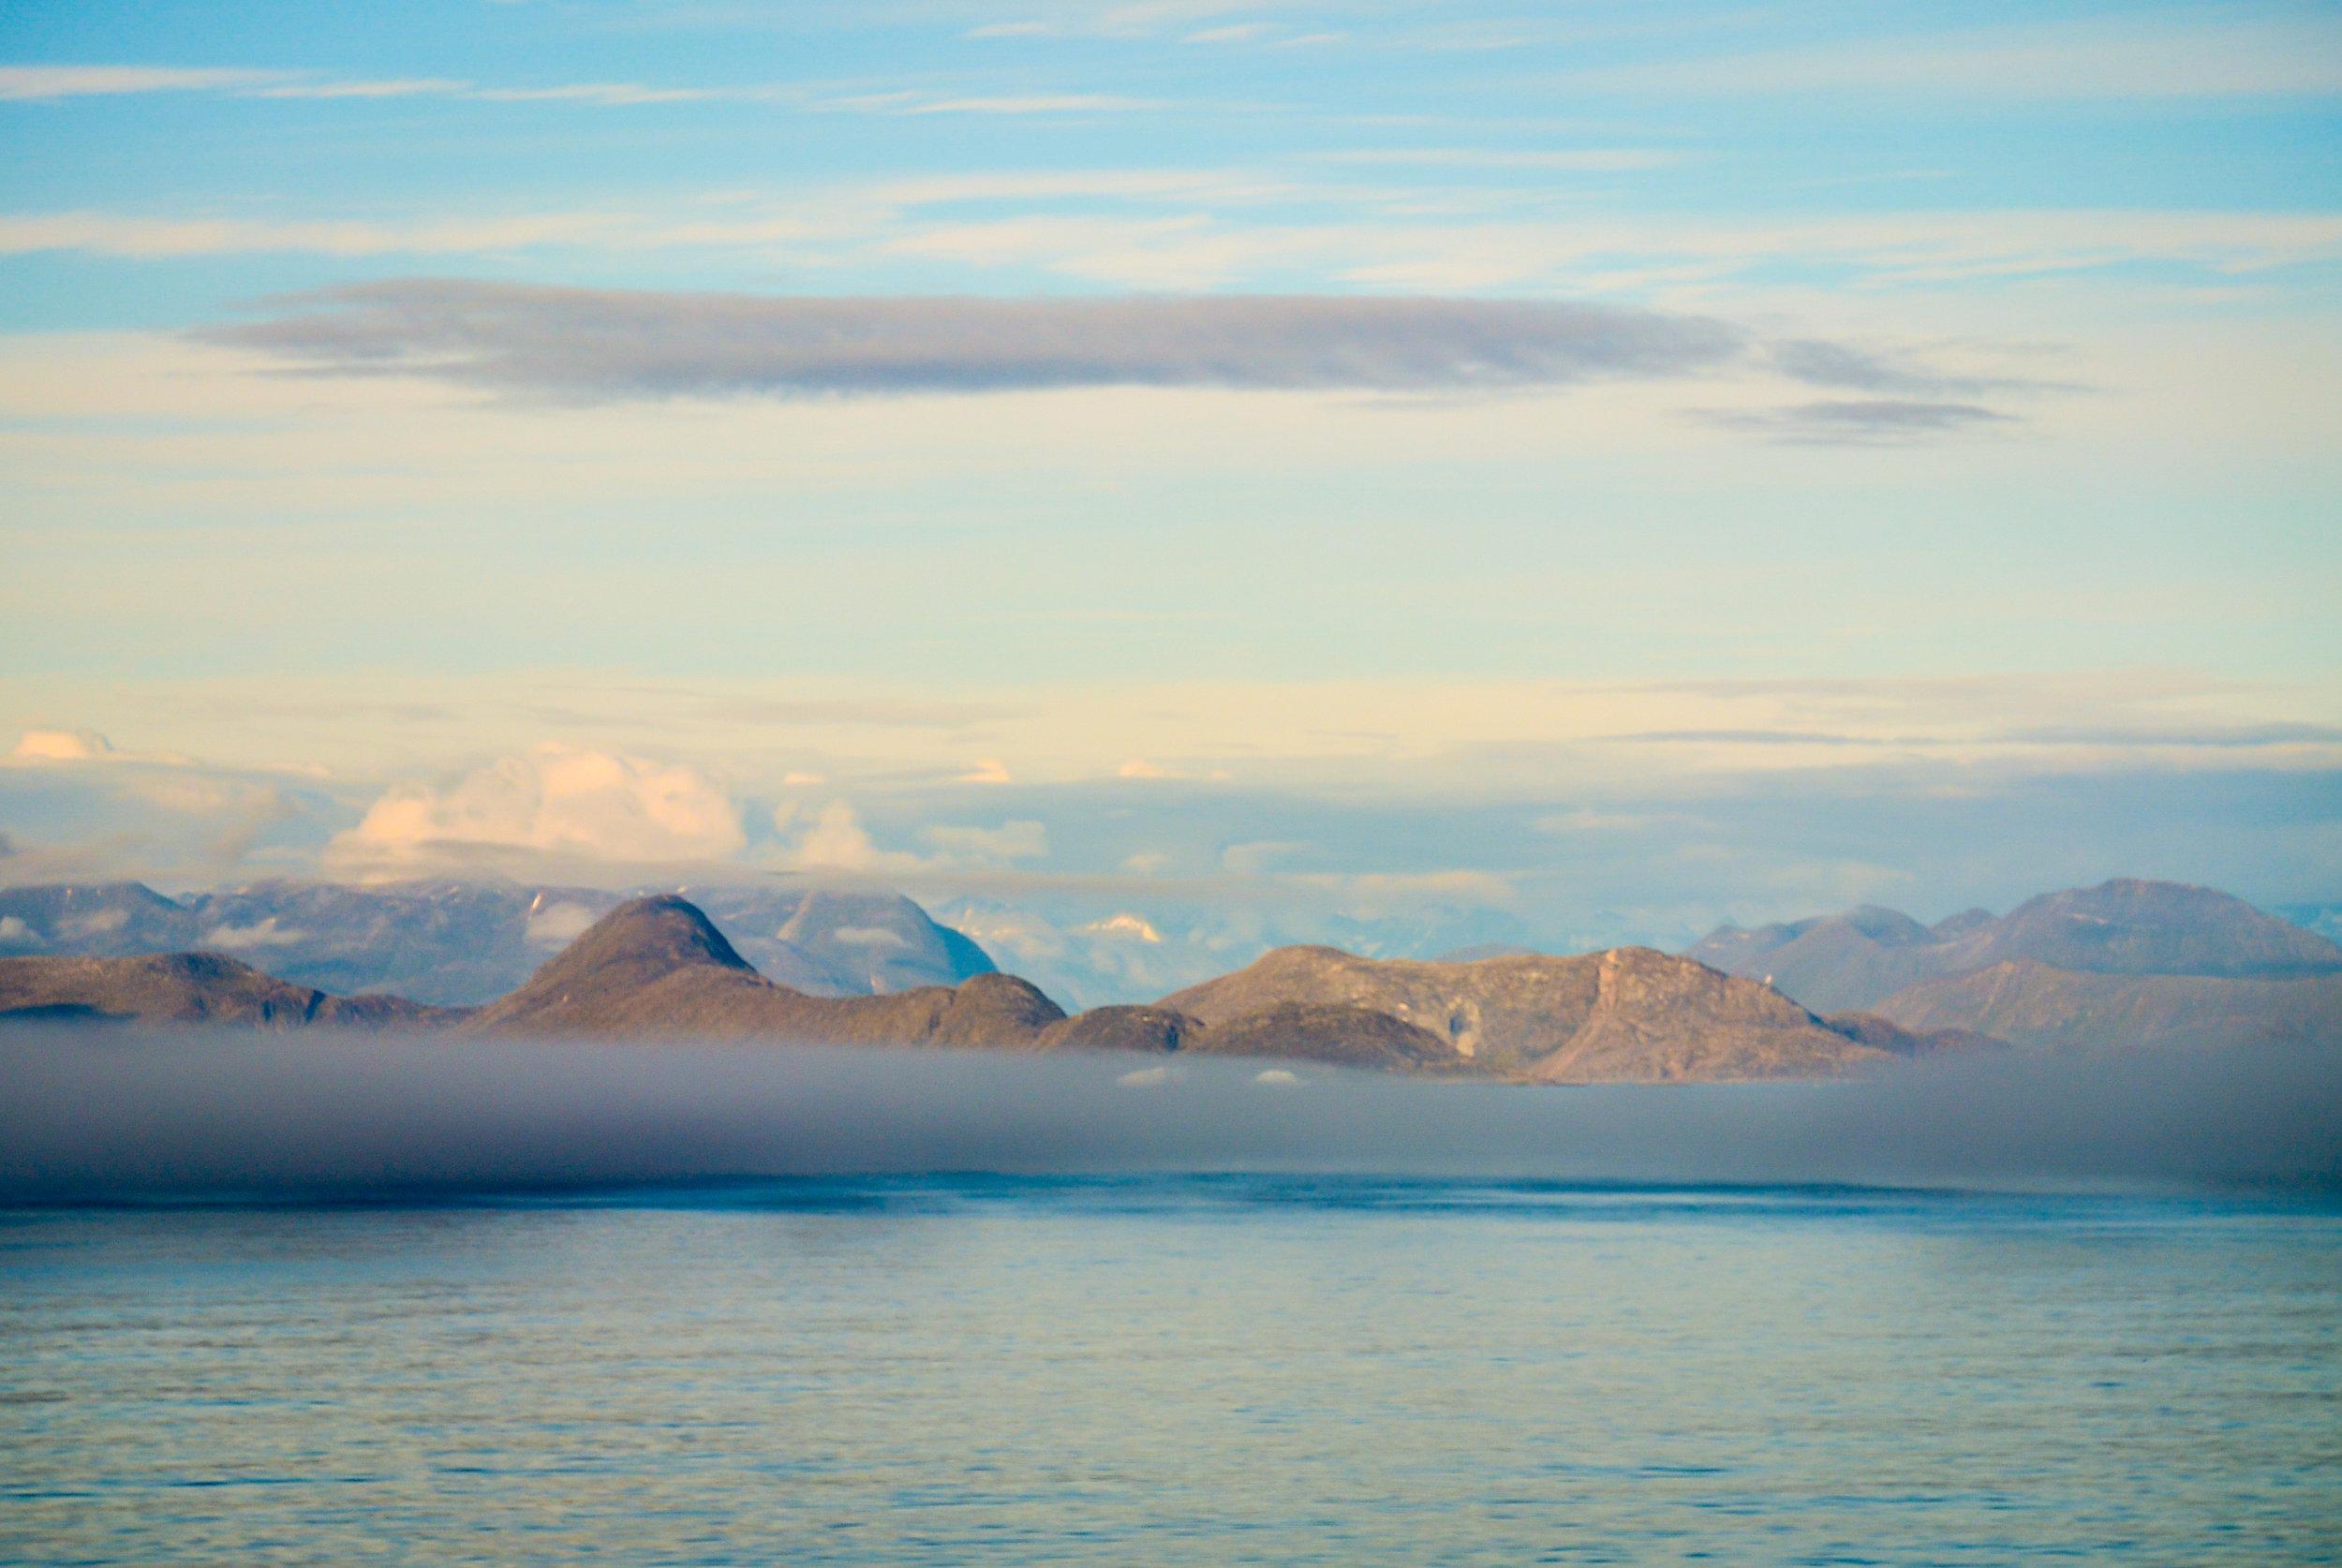 Coastline of southern Greenland